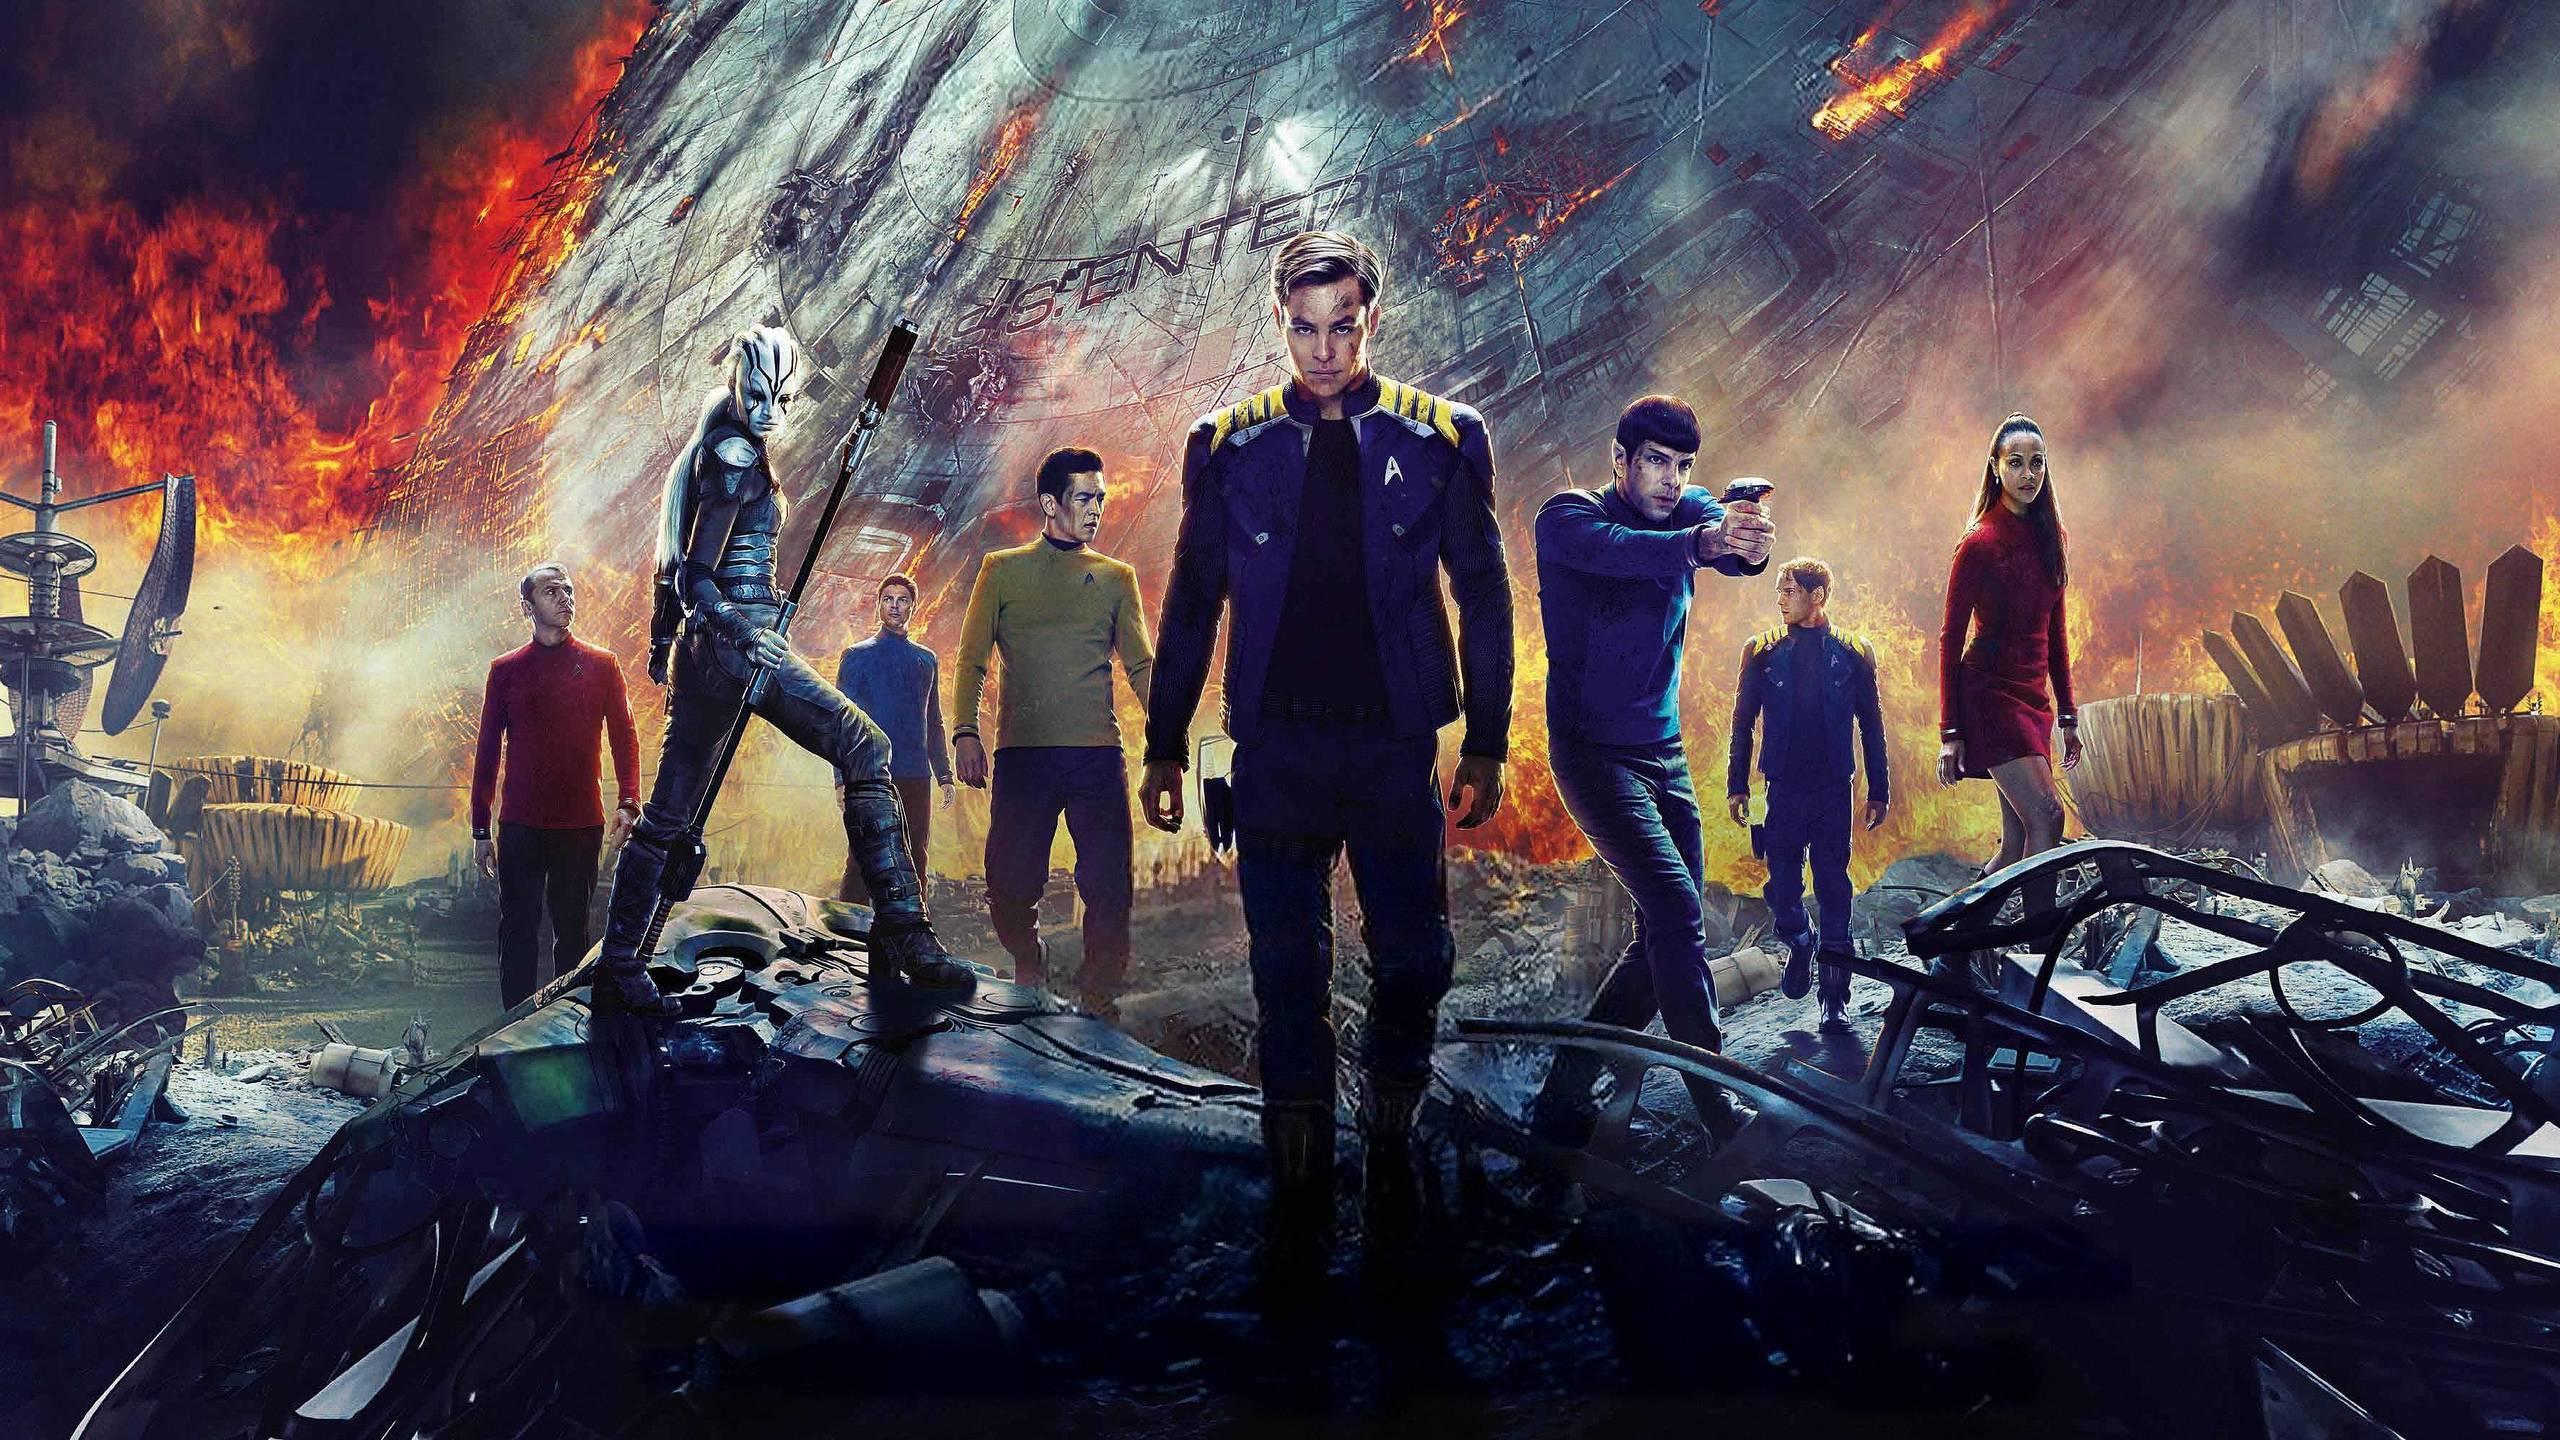 Star Trek Wallpaper - Star Trek Beyond - HD Wallpaper